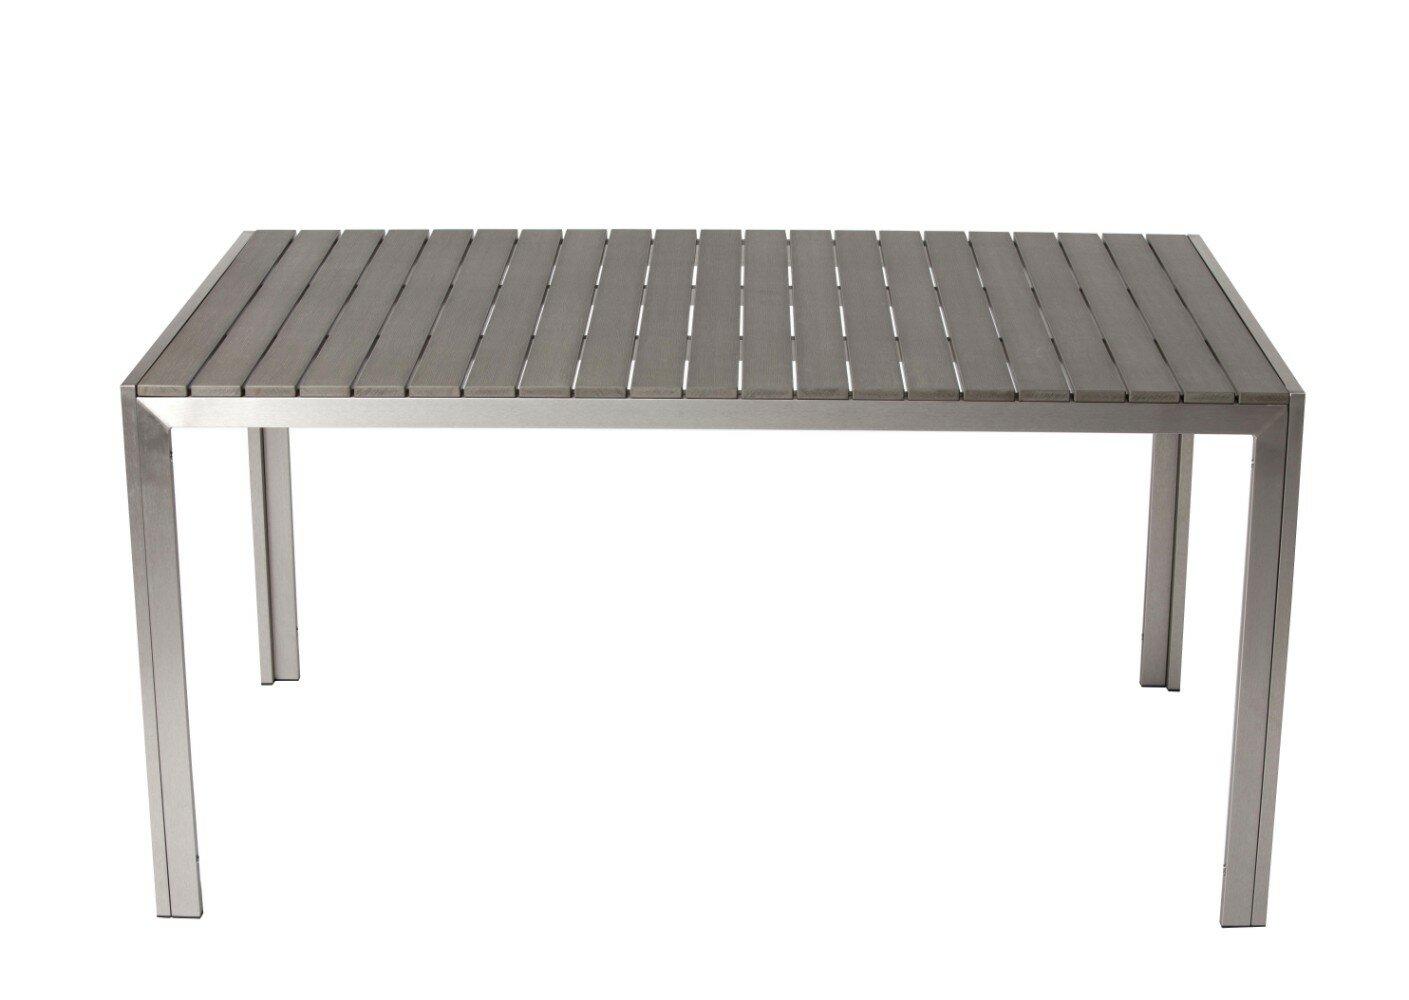 Orren Ellis Latham Sleek And Modish Trendy Anodized Aluminum Dining Table |  Wayfair